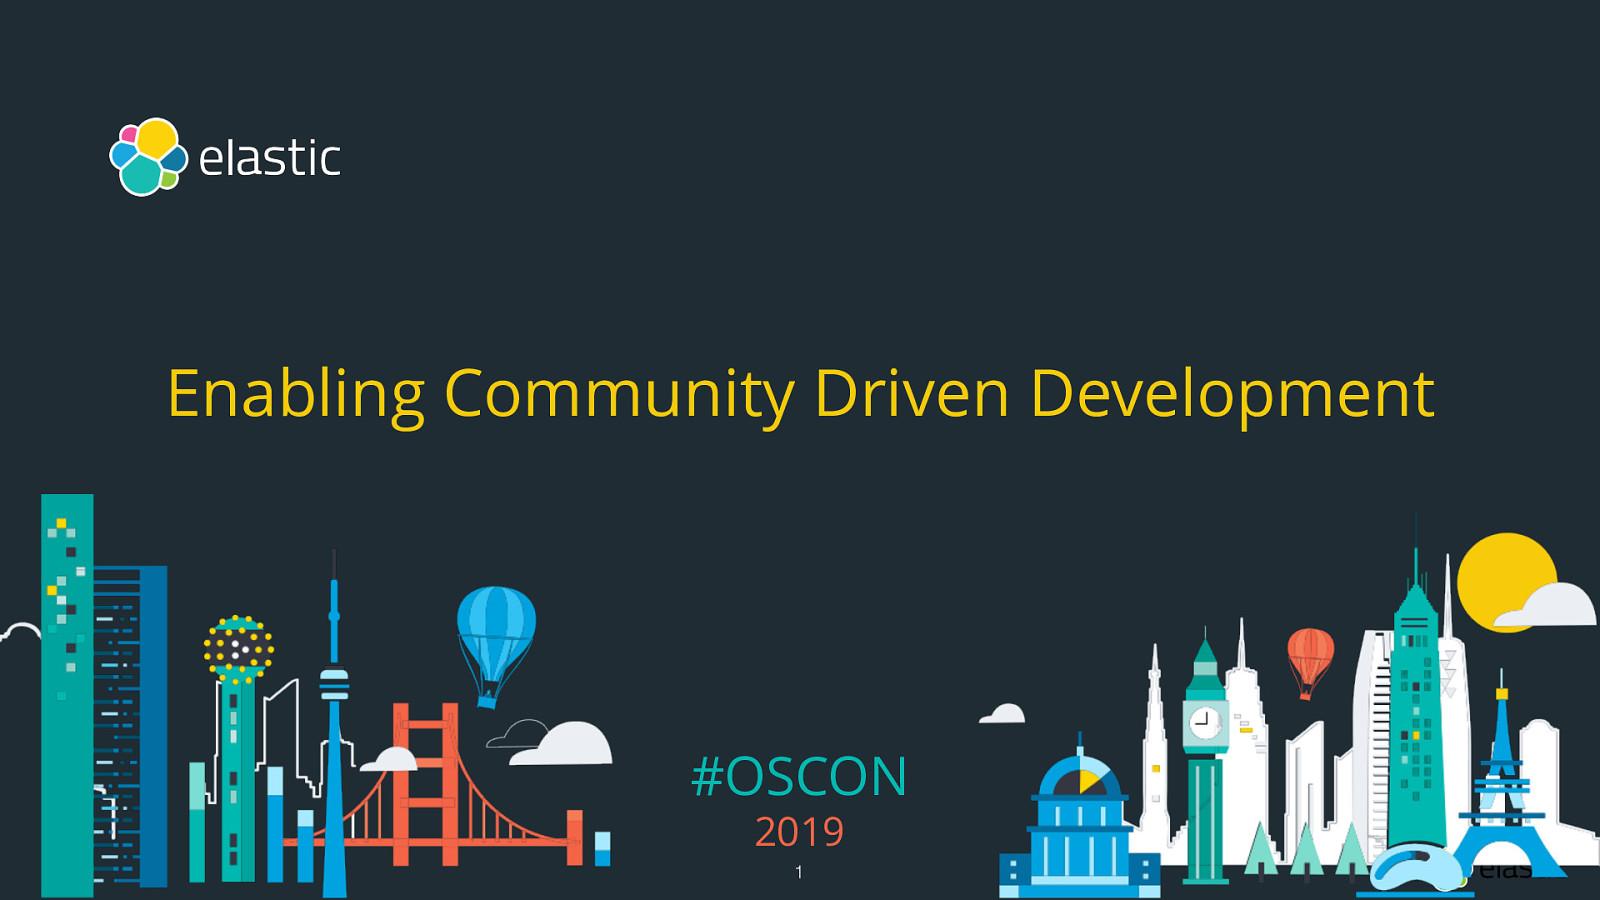 Enabling Community Driven Development